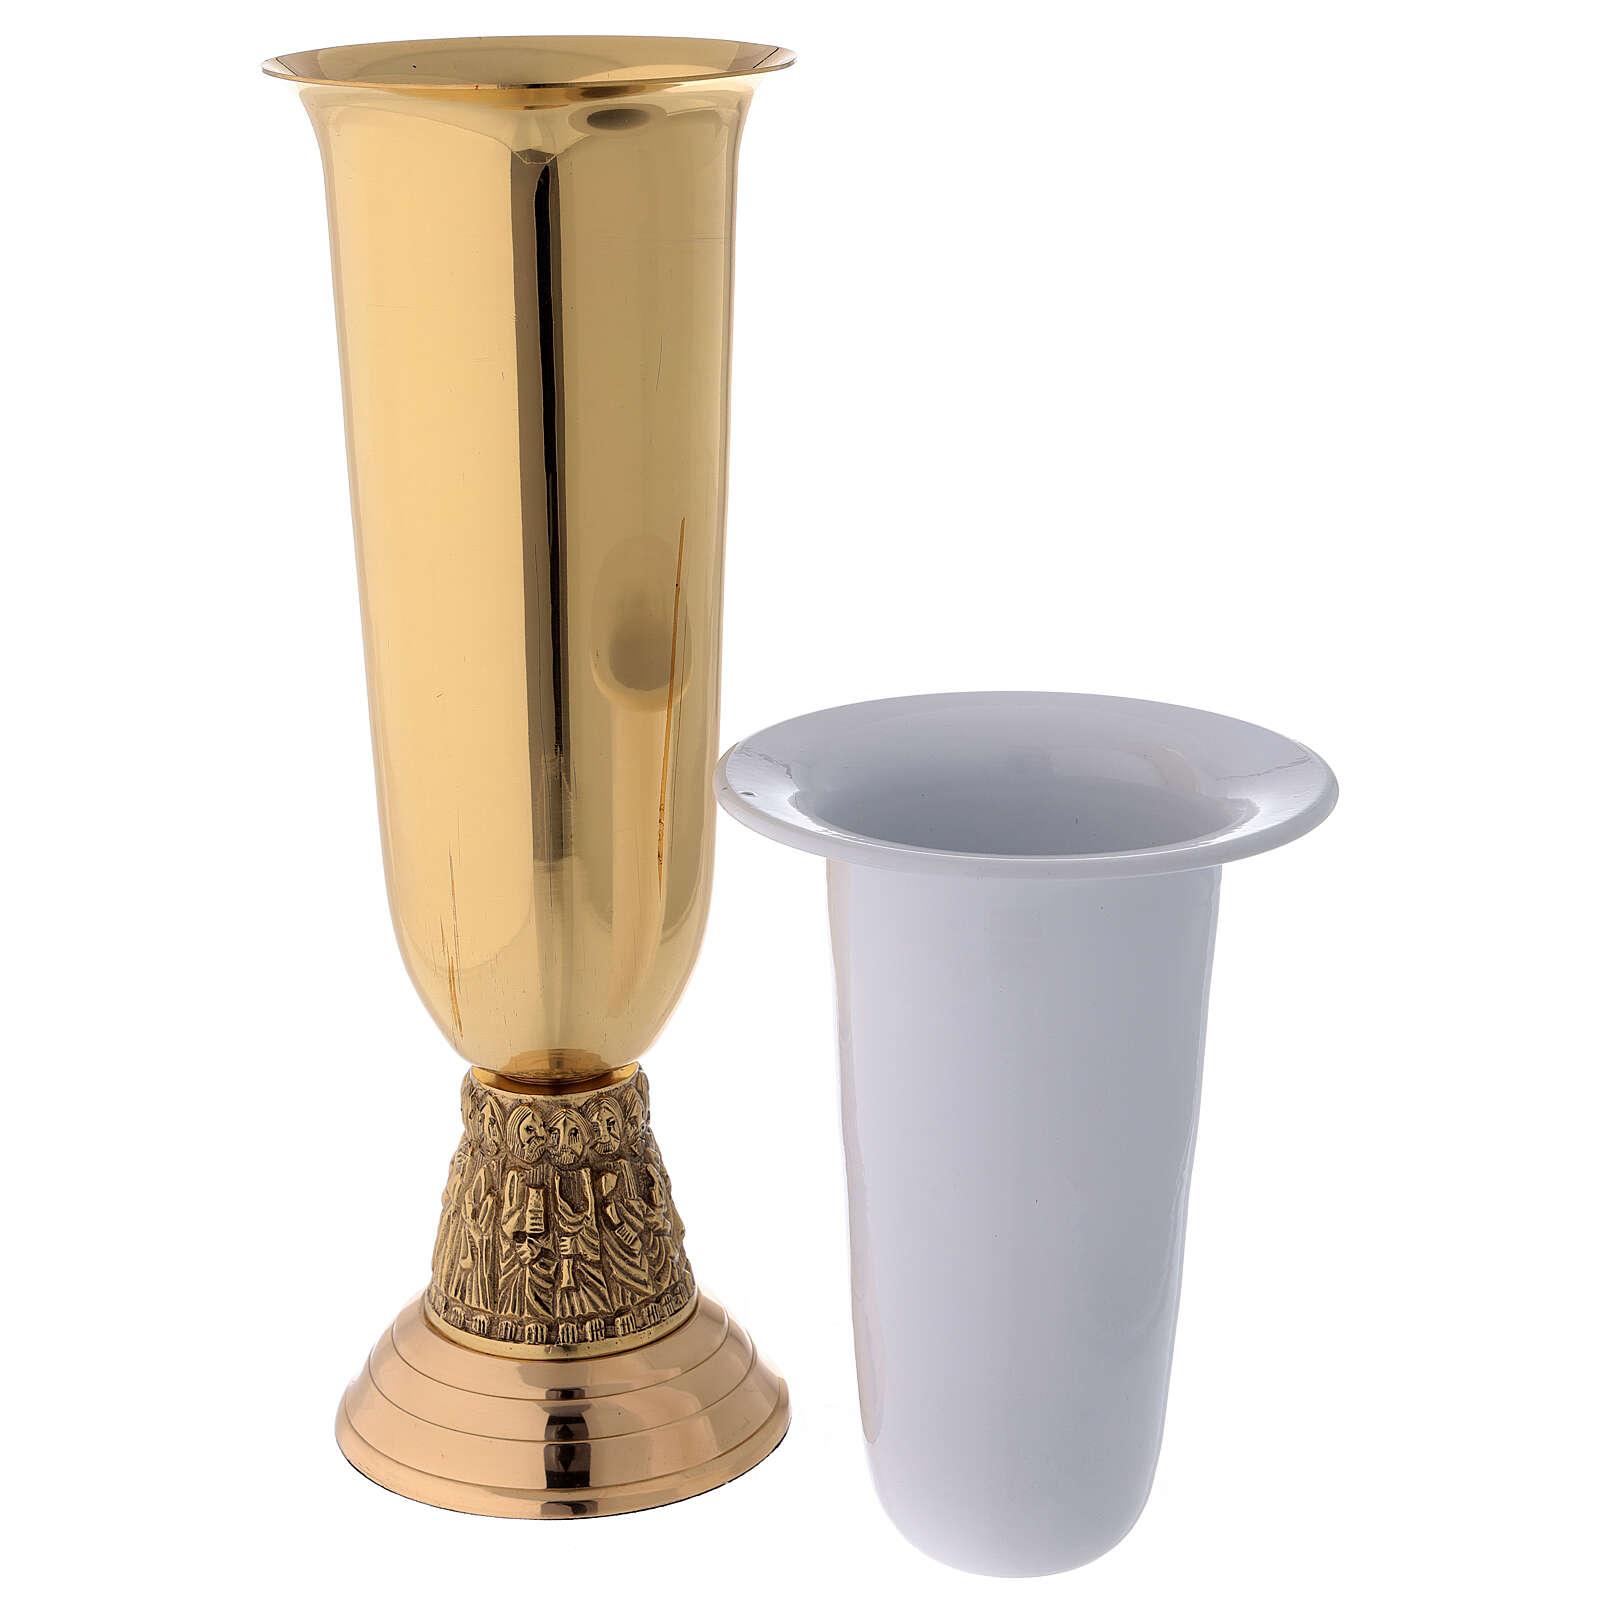 Vaso portafiori ottone dorato cestello acciaio apostoli 3